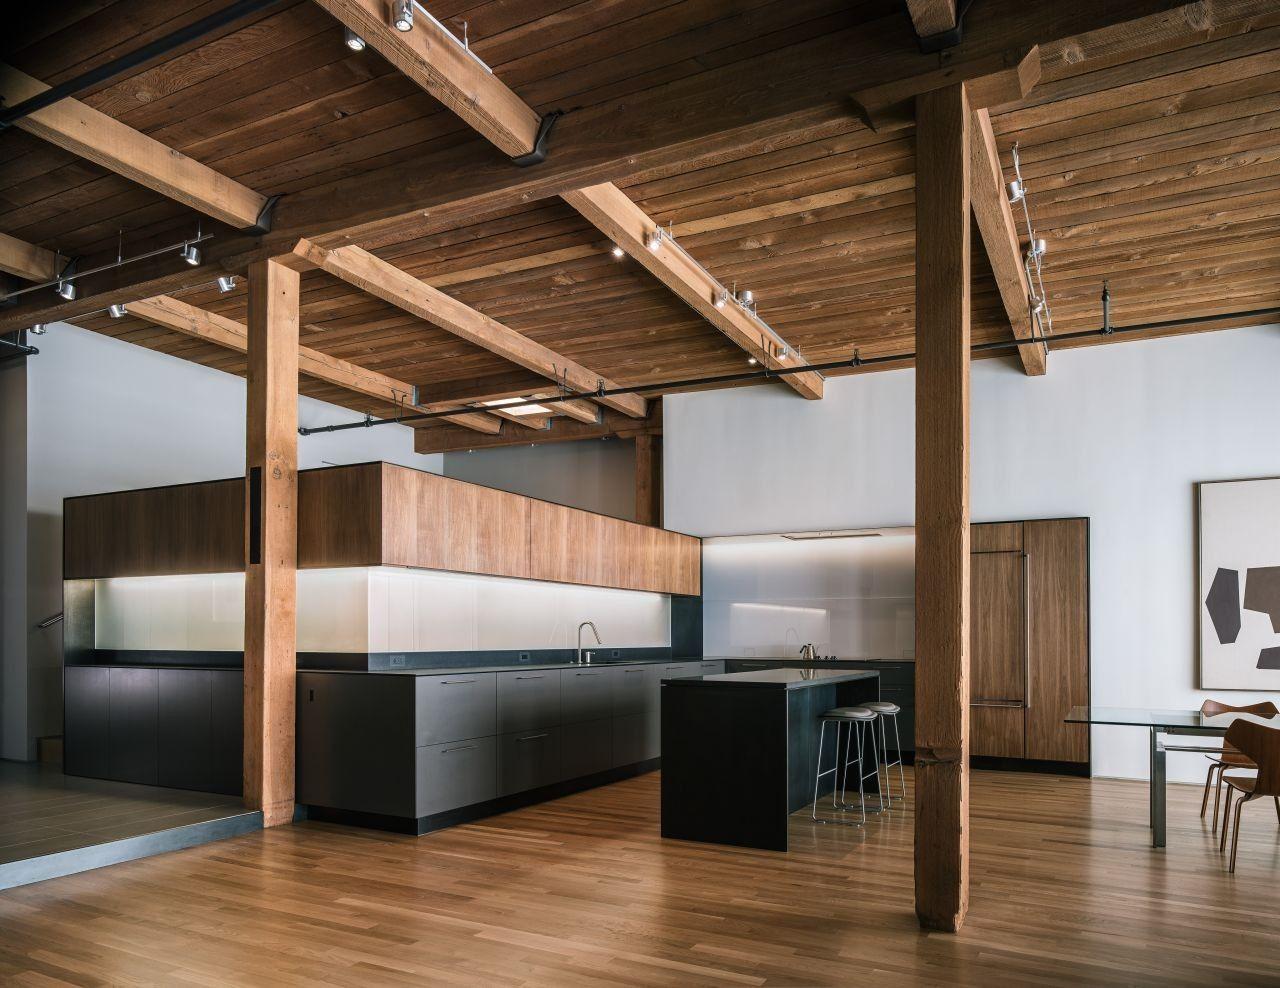 Gallery Of San Francisco Loft Lineoffice Architecture 3 Projeto De Loft Lofts Modernos Cozinha Contemporanea